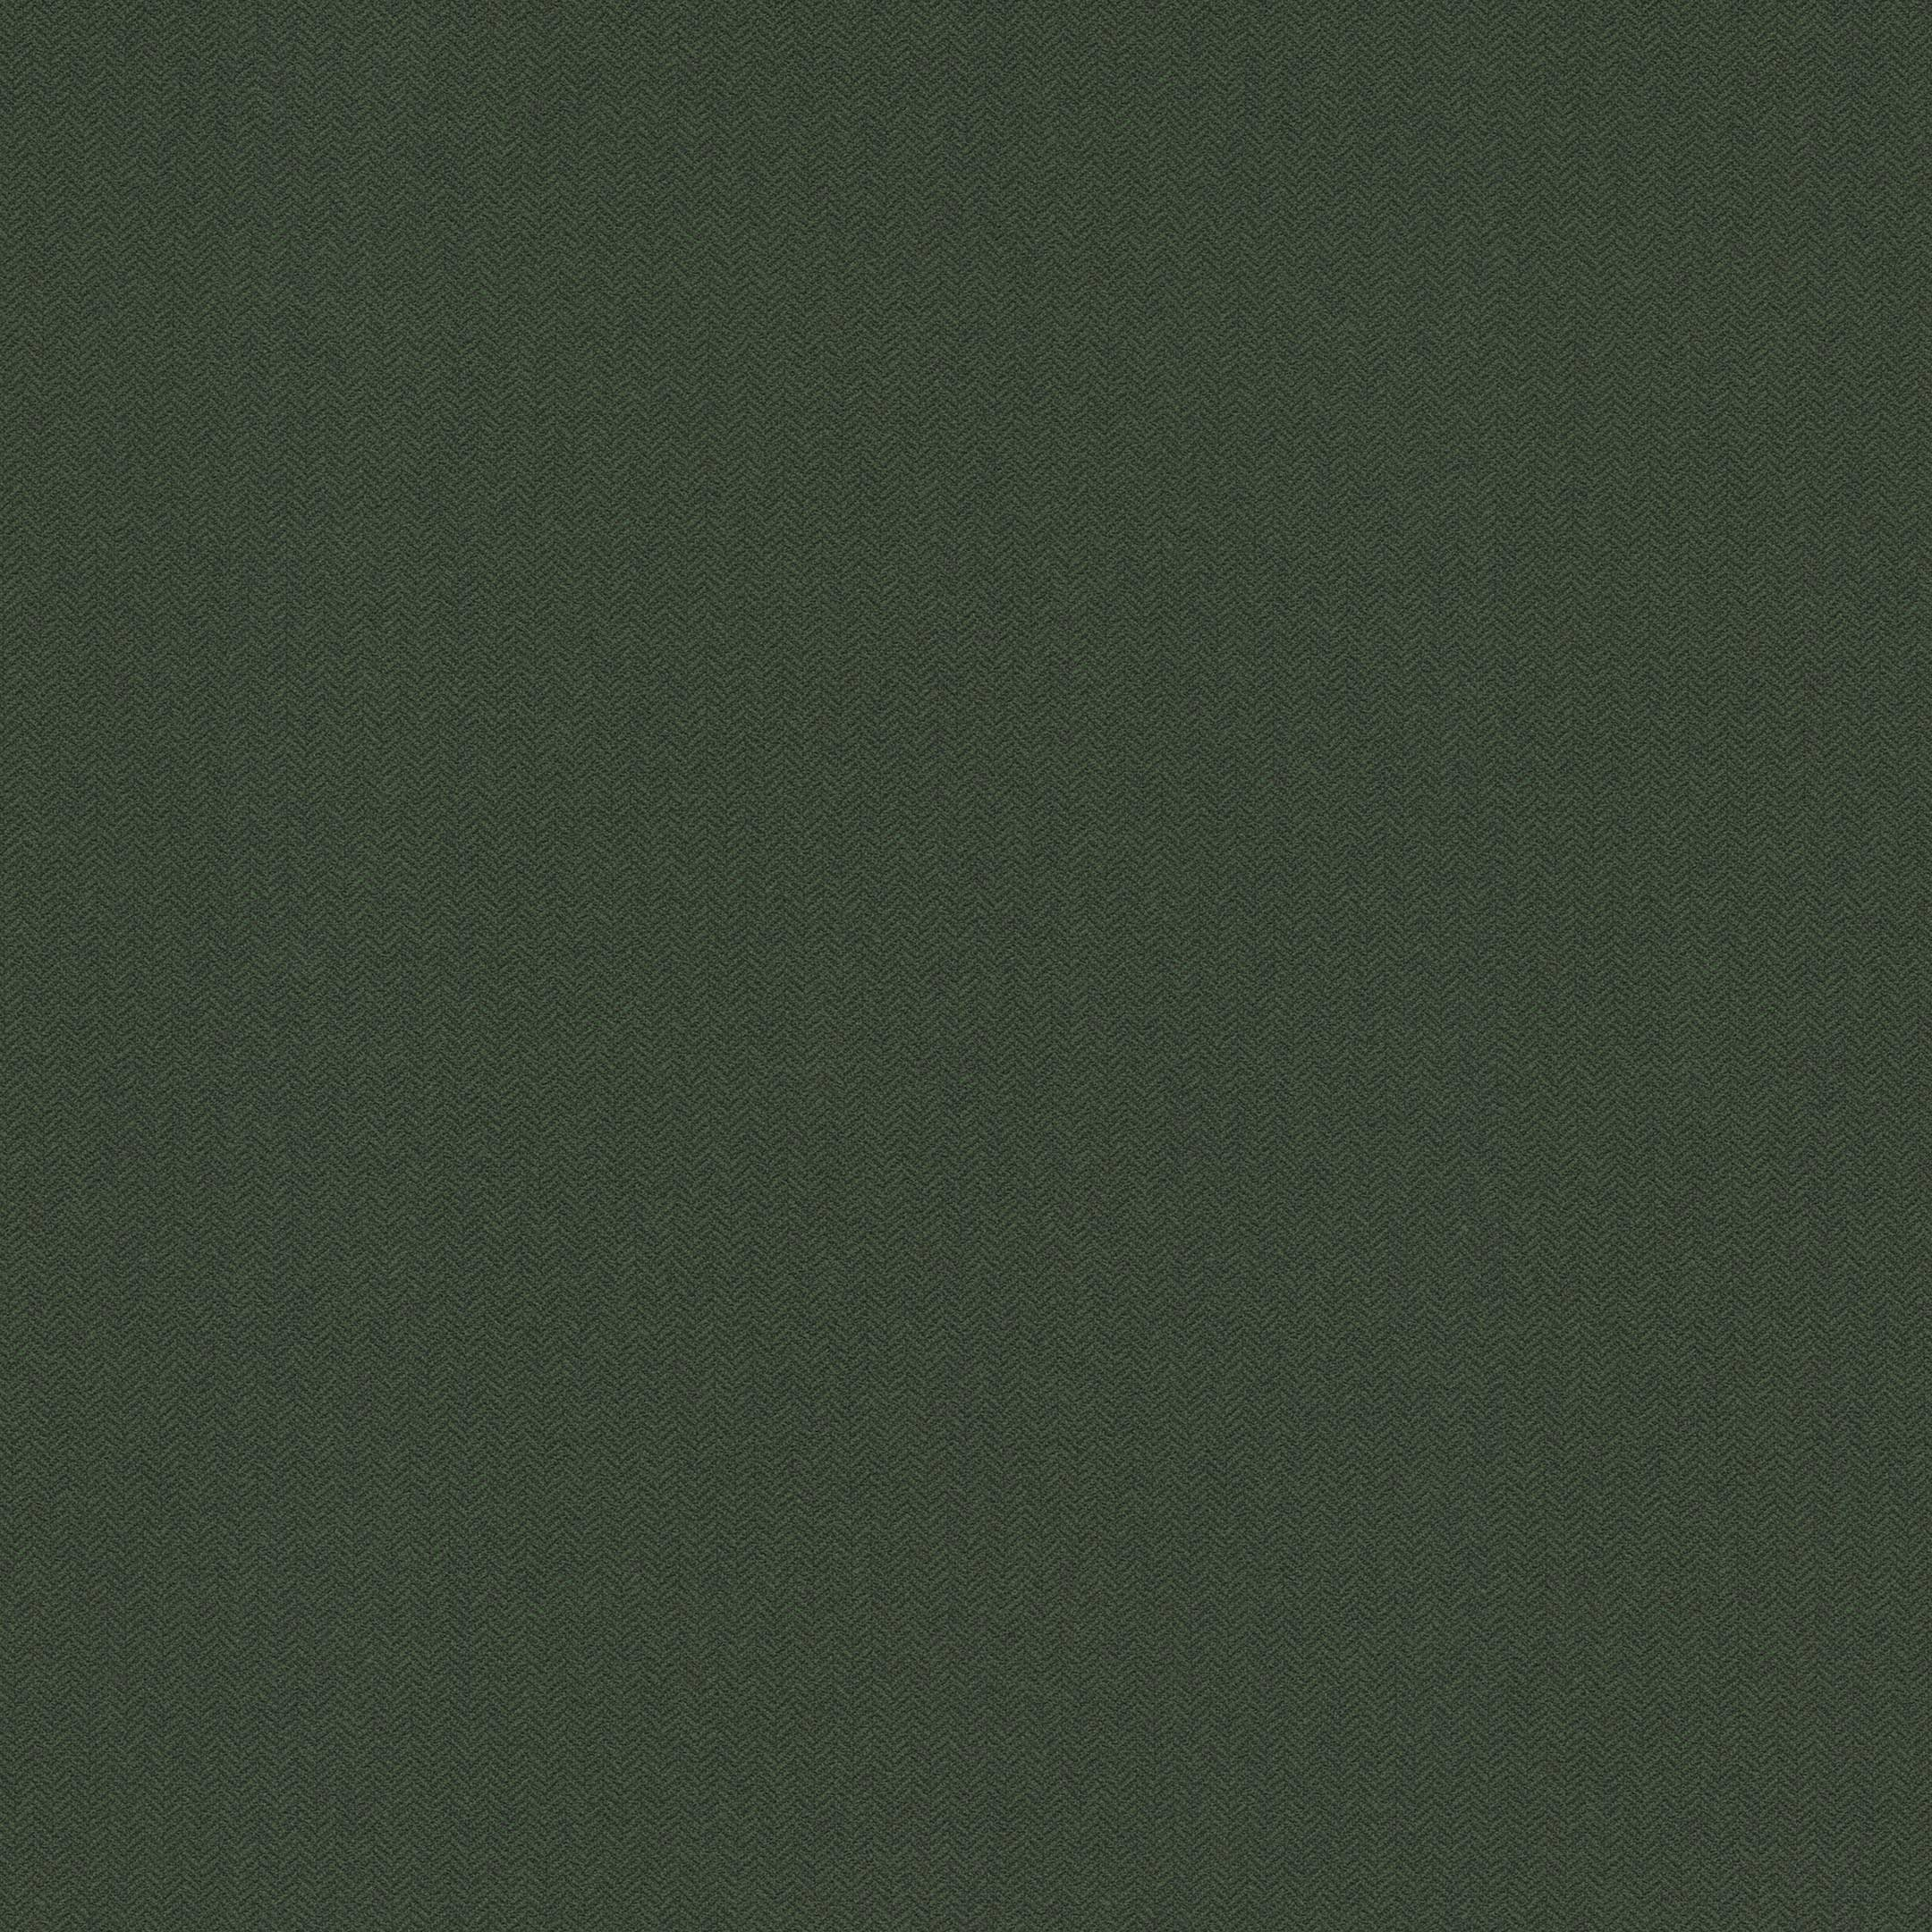 Обои компакт-винил на флизелиновой основе Rasch b.b home passion VI 860245 (0,53х10 м) rasch обои 575620 rasch cosmopolitan